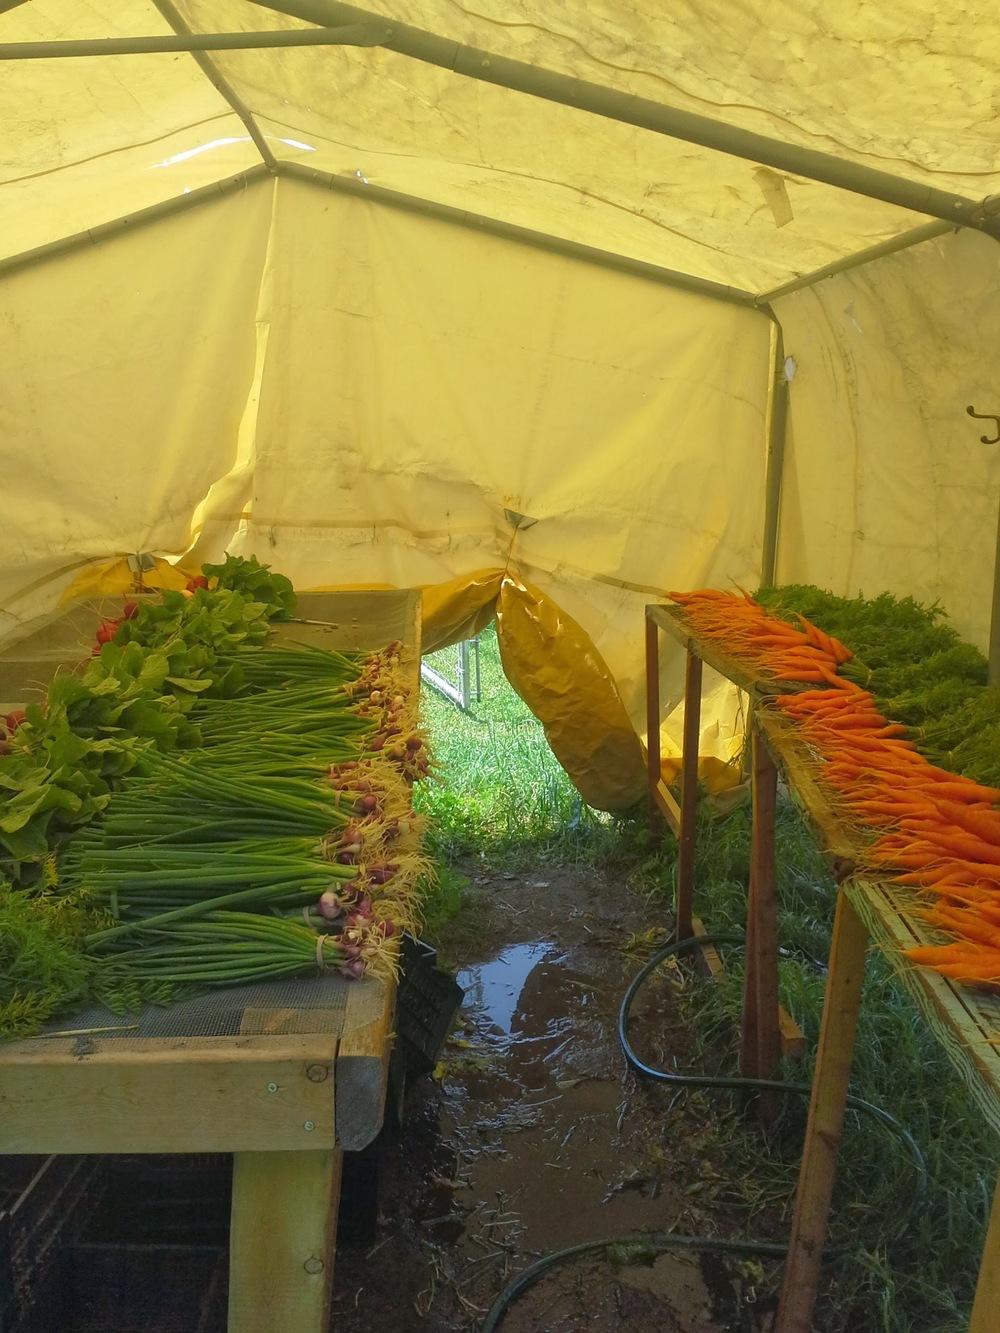 Wash tent